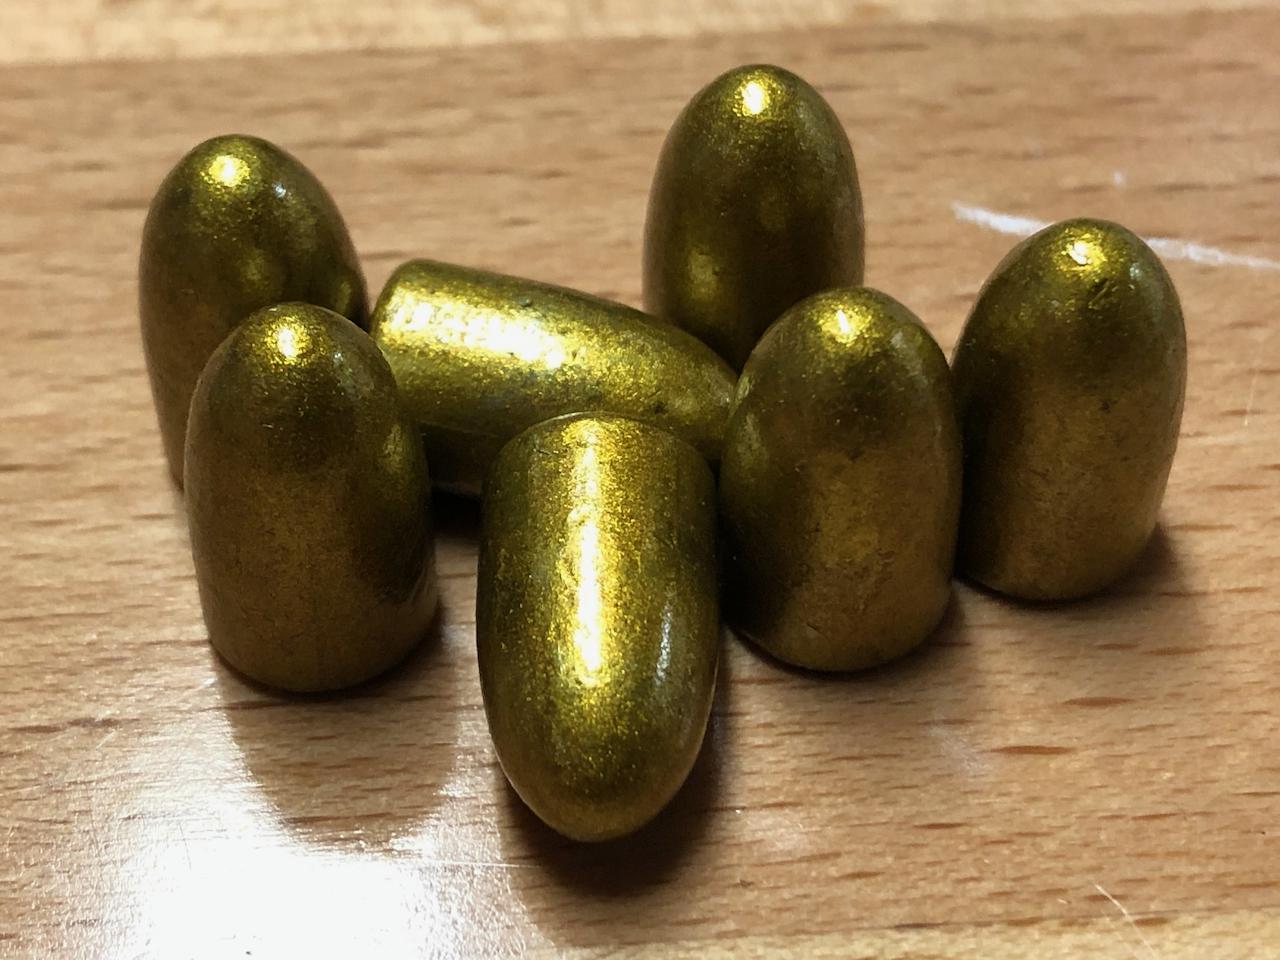 9mm 147gr Round Nose/Bevel Base/No Groove (710ct , $0 059/bullet)